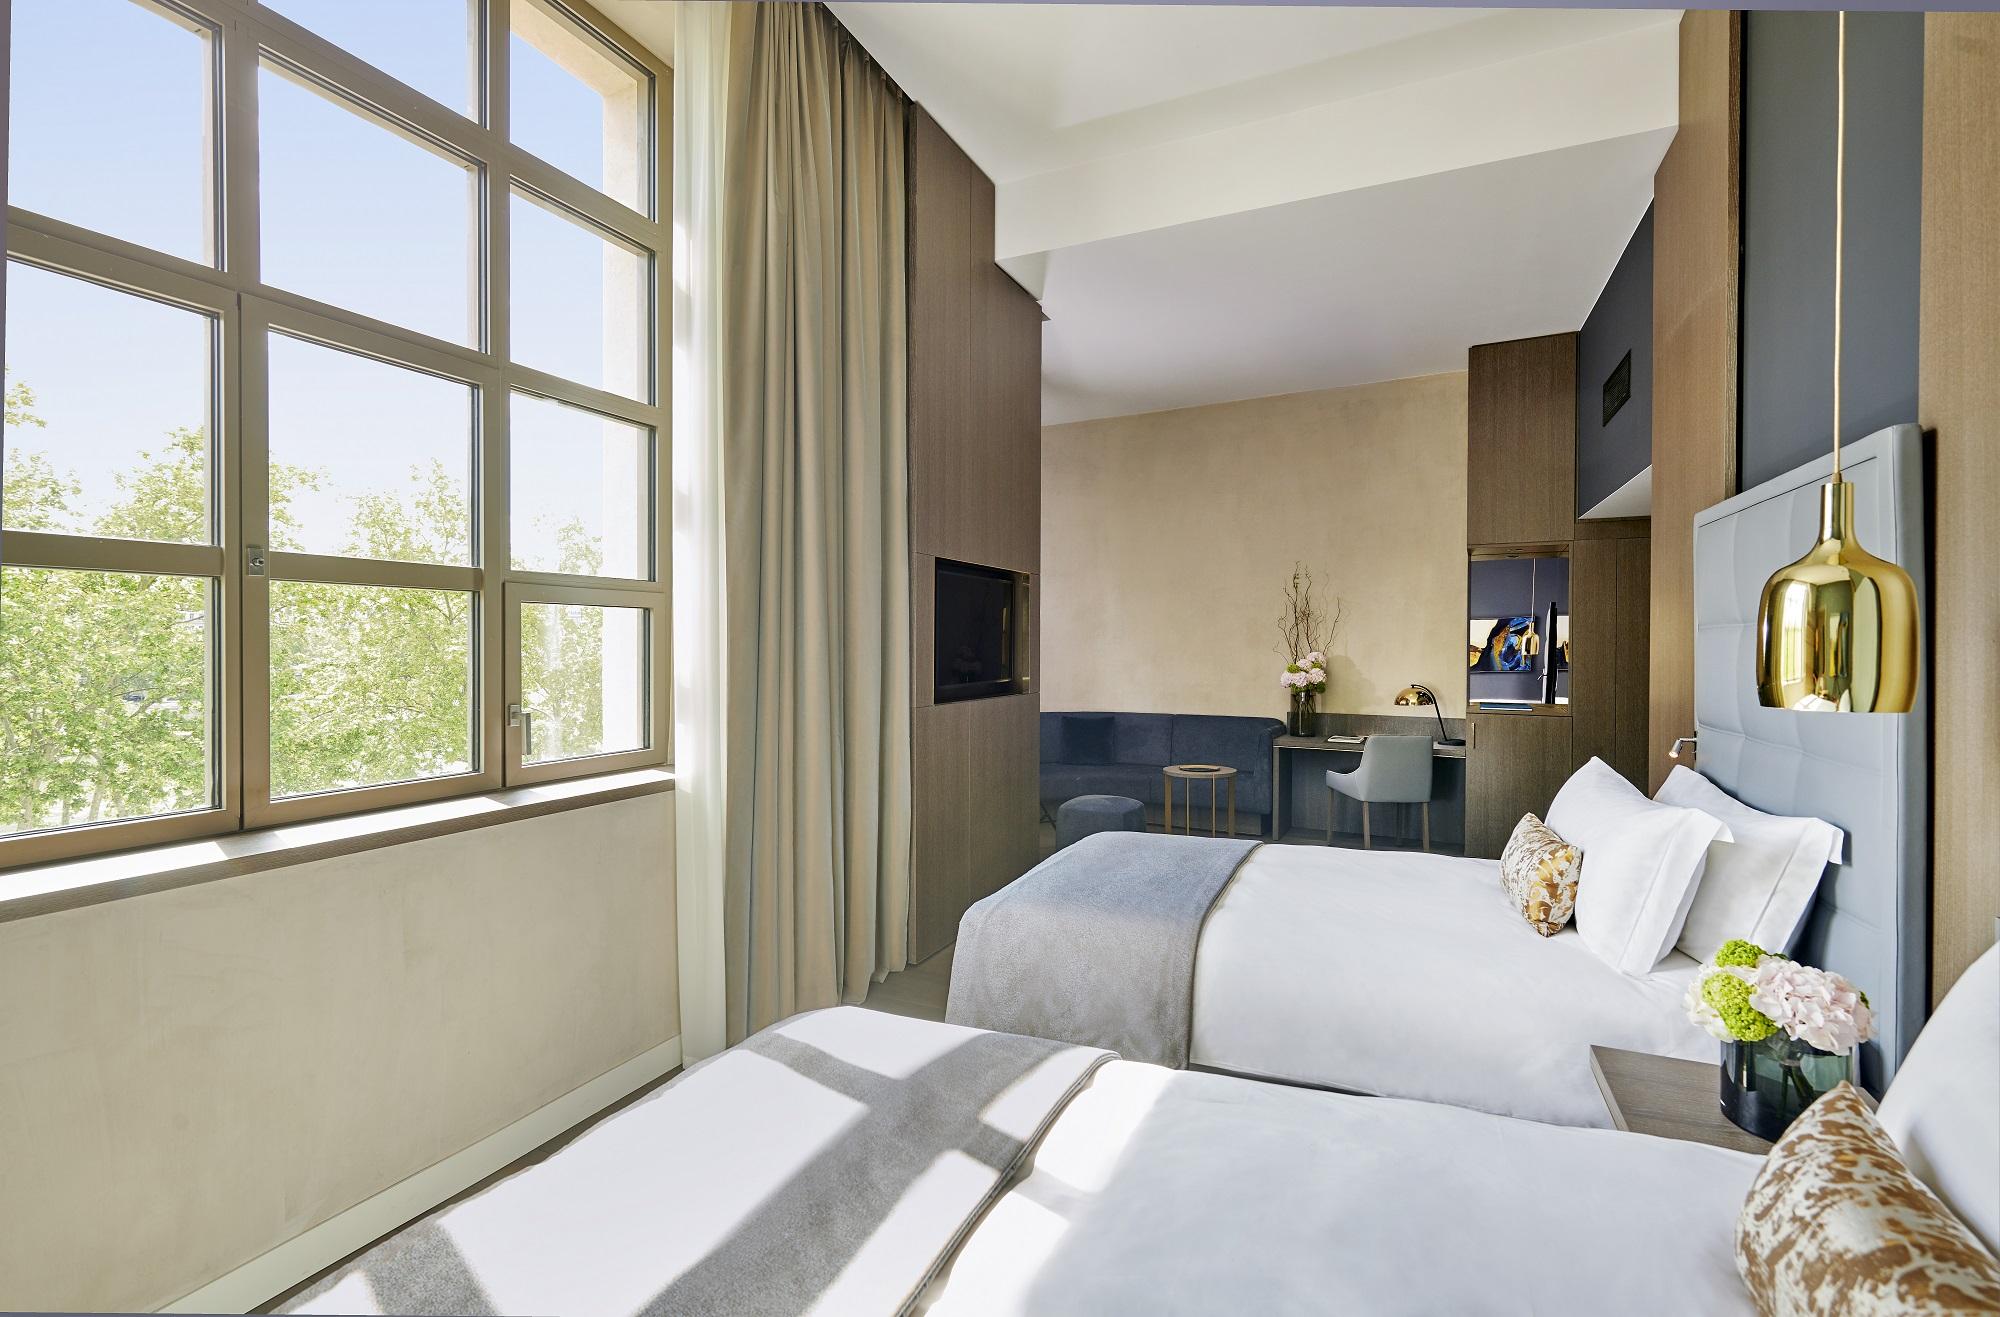 InterContinental Lyon - Hotel Dieu_Suite Junior